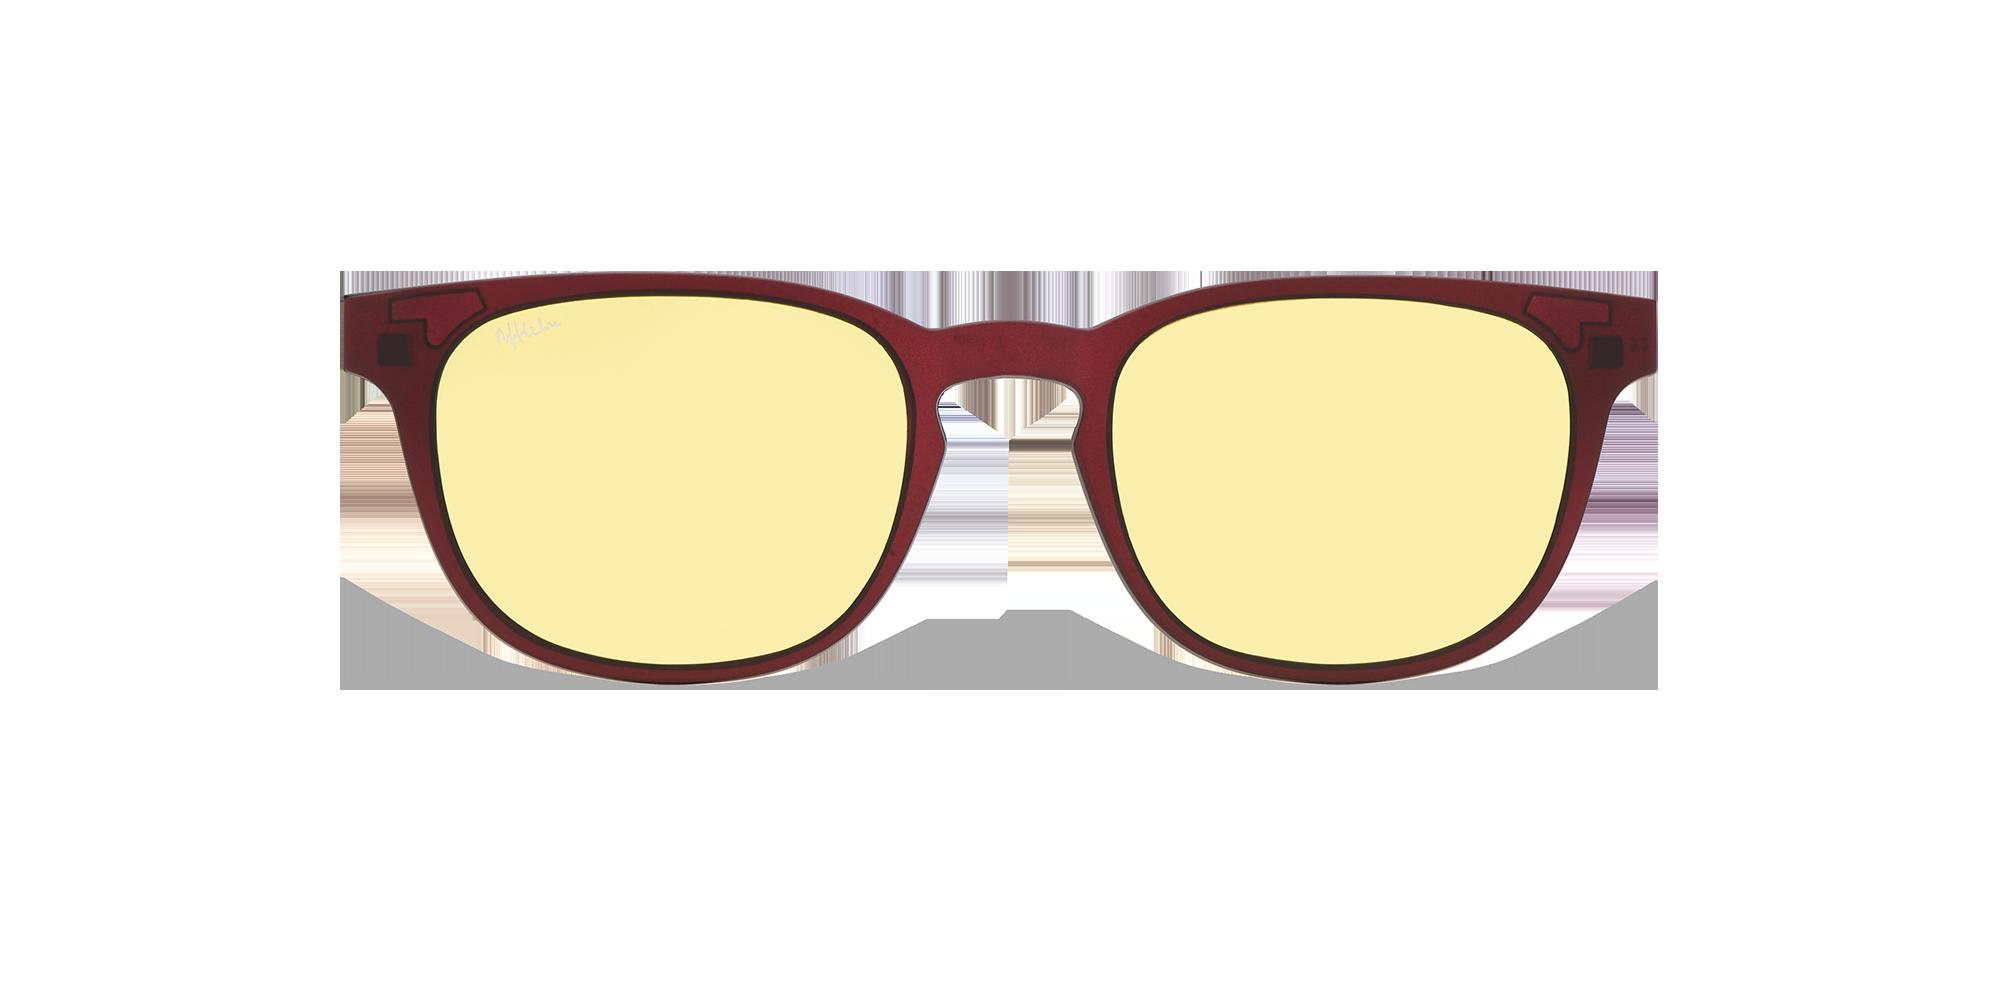 afflelou/france/products/smart_clip/clips_glasses/TMK33YERD015120.png